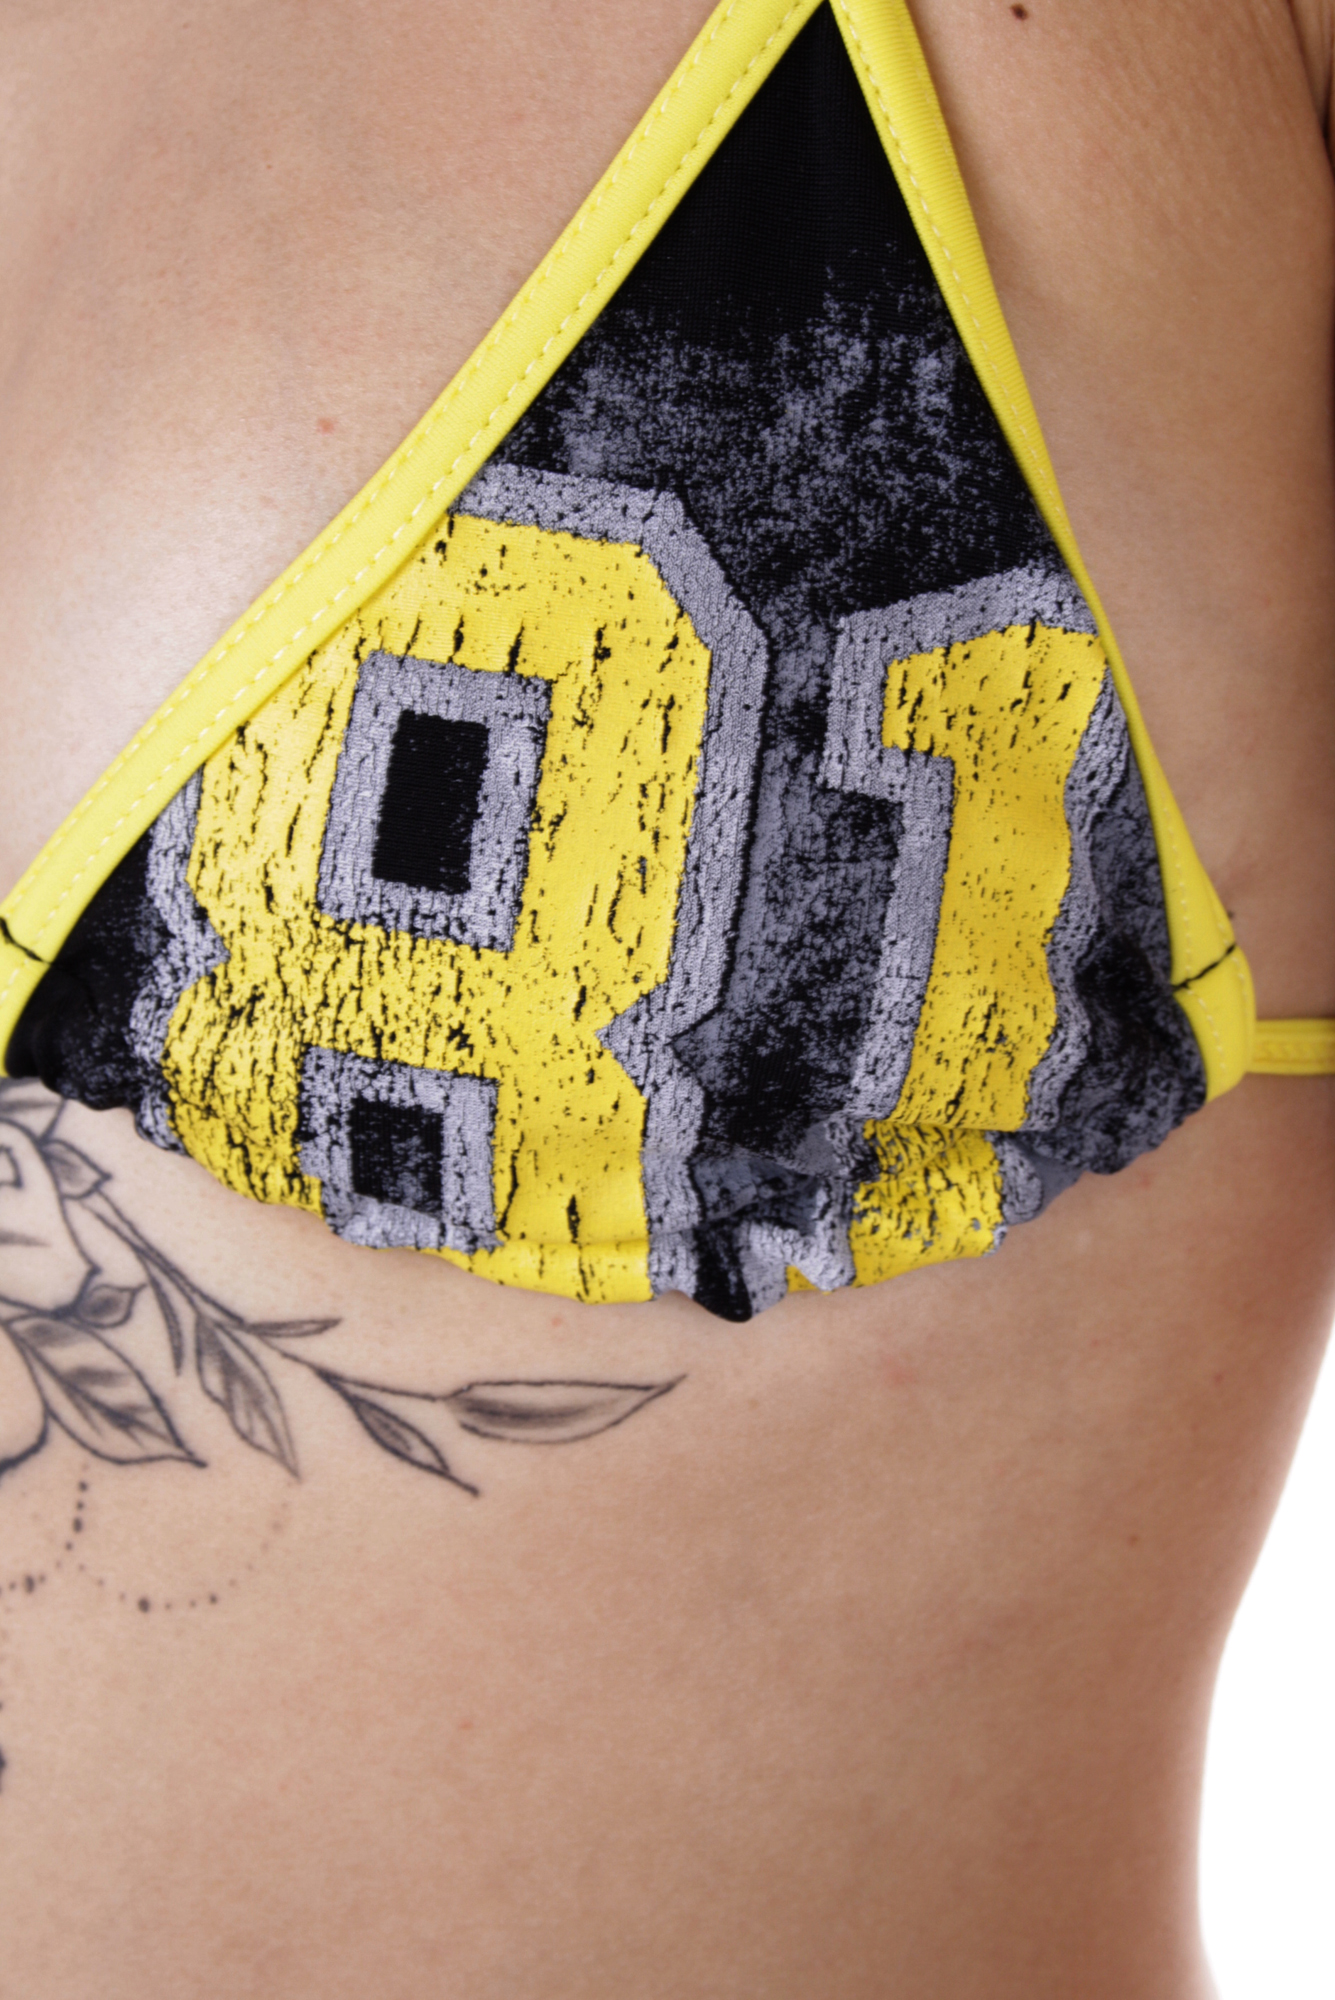 replay bikini badeanzug triangel bh string gr 34 40 cup aa b 36. Black Bedroom Furniture Sets. Home Design Ideas